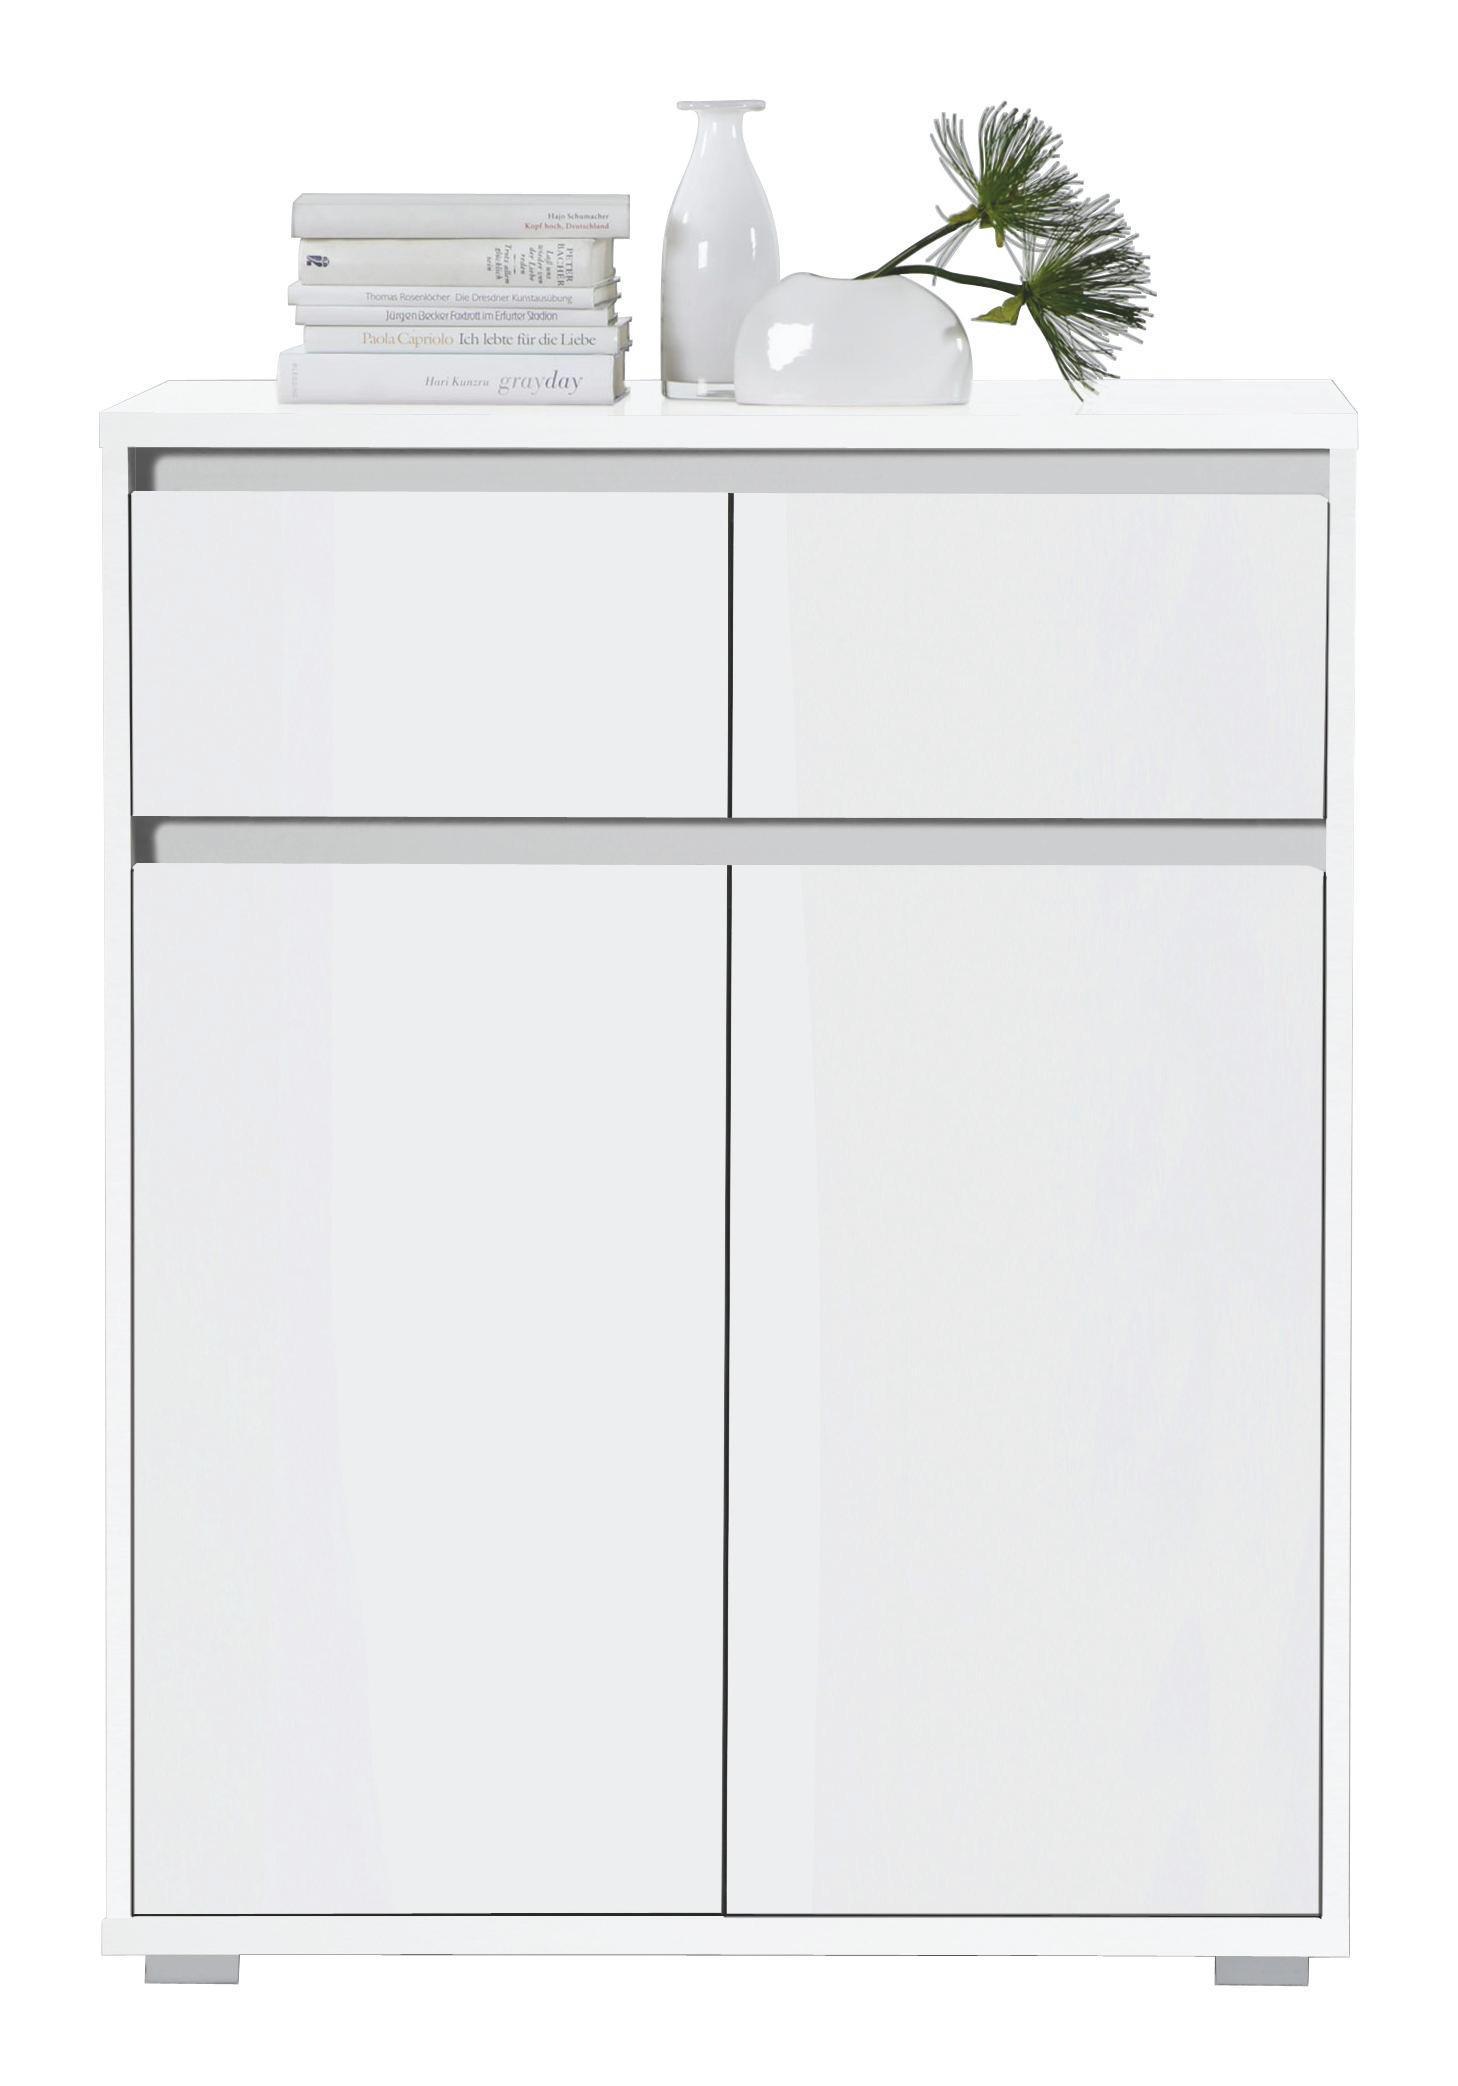 KOMODA - bela/srebrna, Design, leseni material (80/103/48cm) - BOXXX